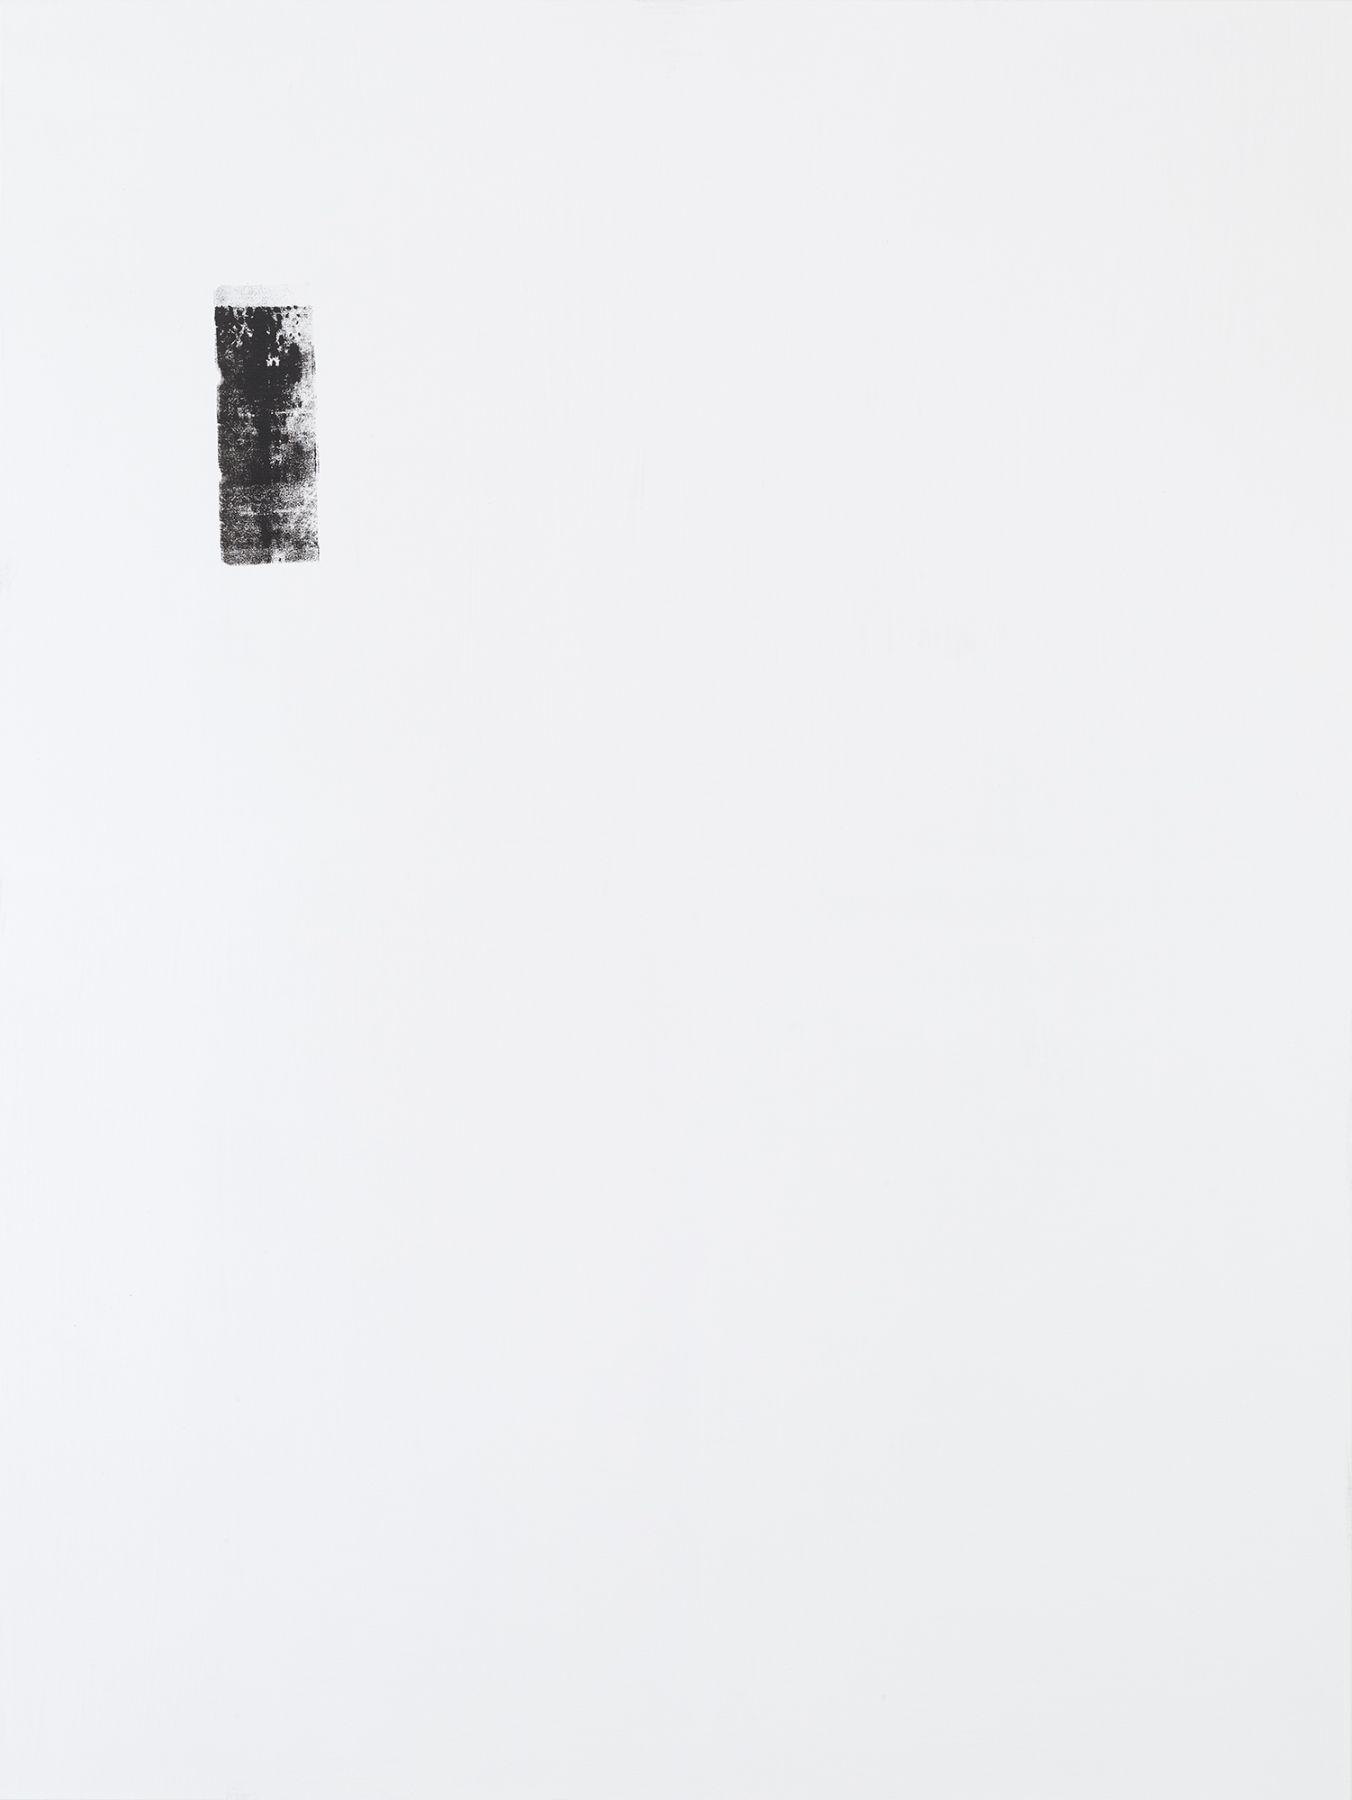 Michael Krebber MK.287, 2015 Acrylic on canvas  78 3/4 x 59 1/8 inches (200 x 150.2 cm)